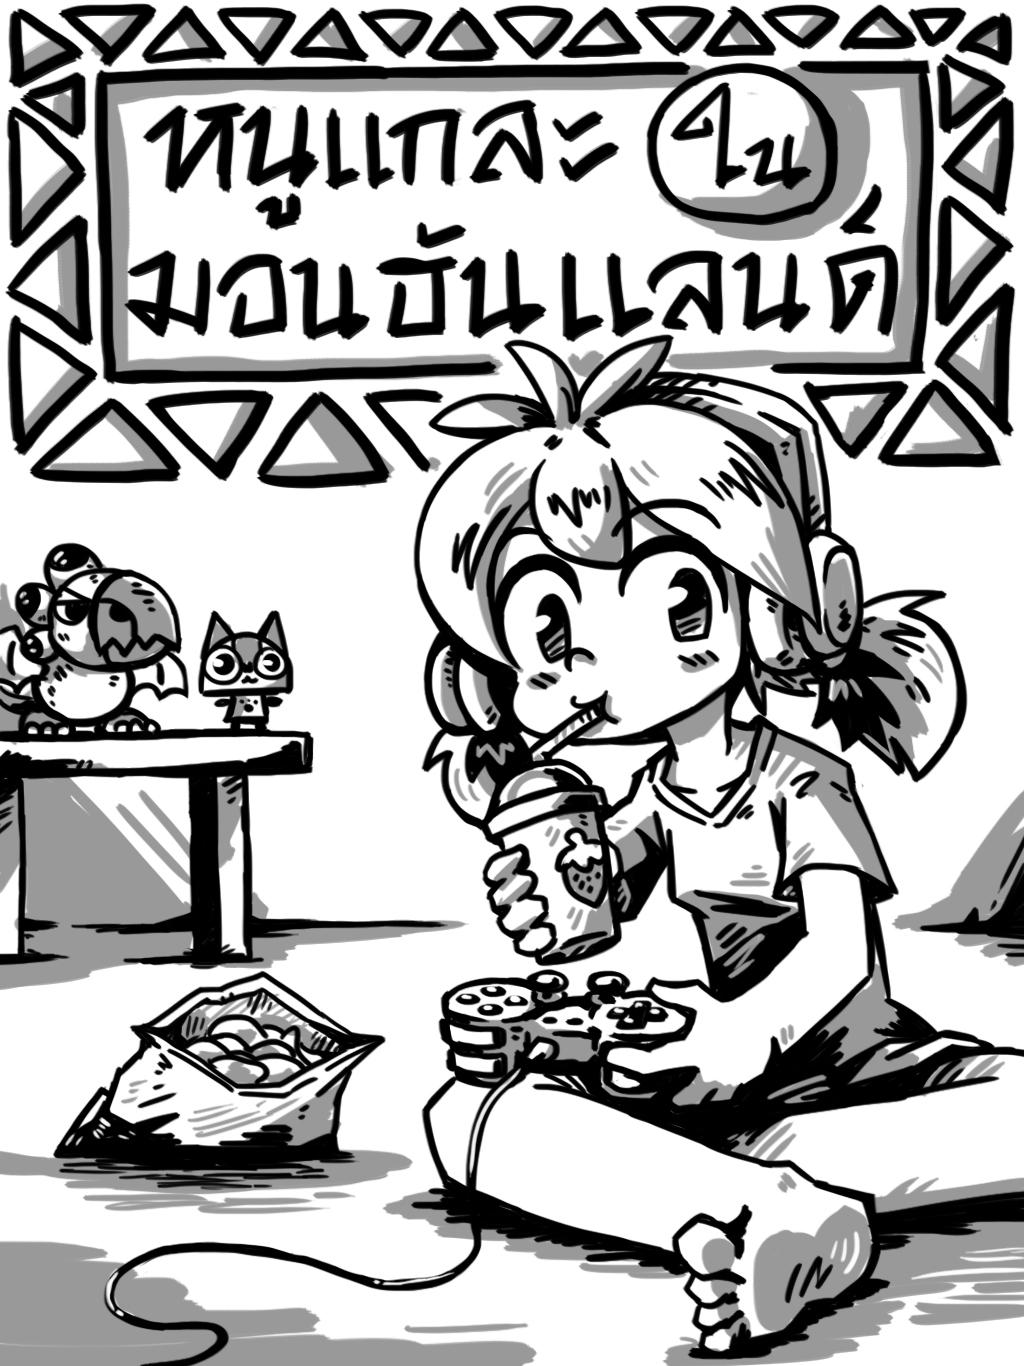 PS4น้องสาว - นางฟ้าาาา